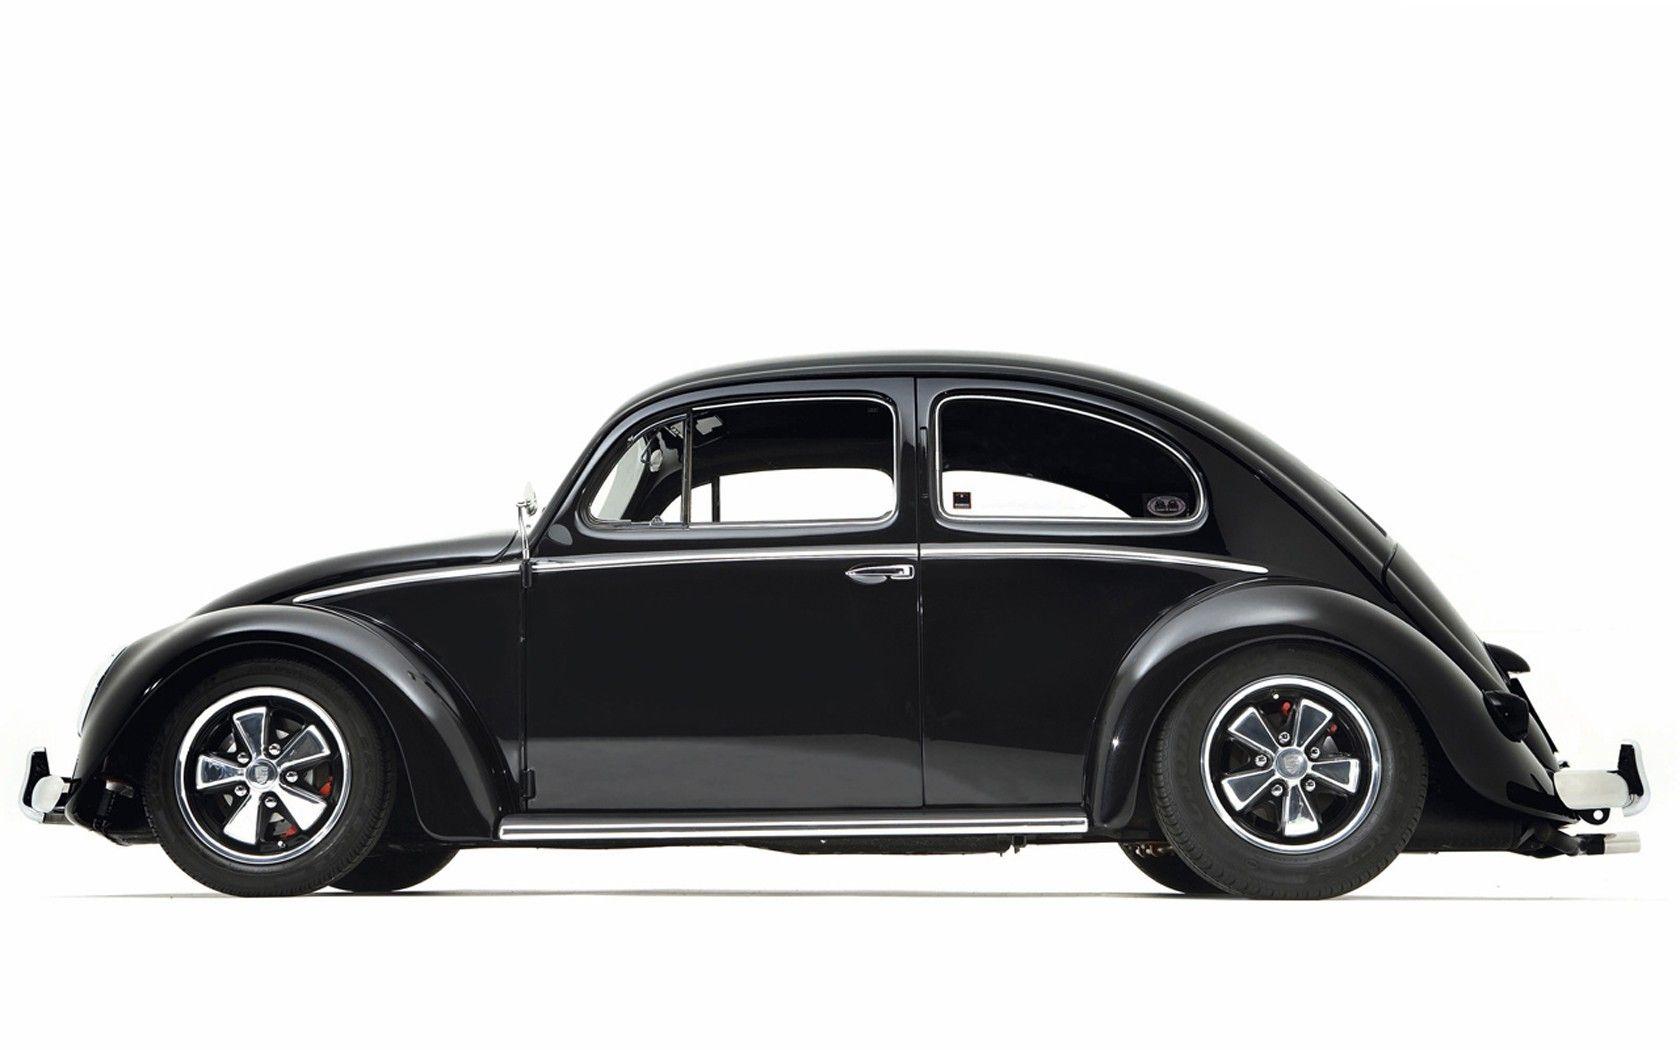 general 1680x1050 vehicles cars vw beetle vintage white